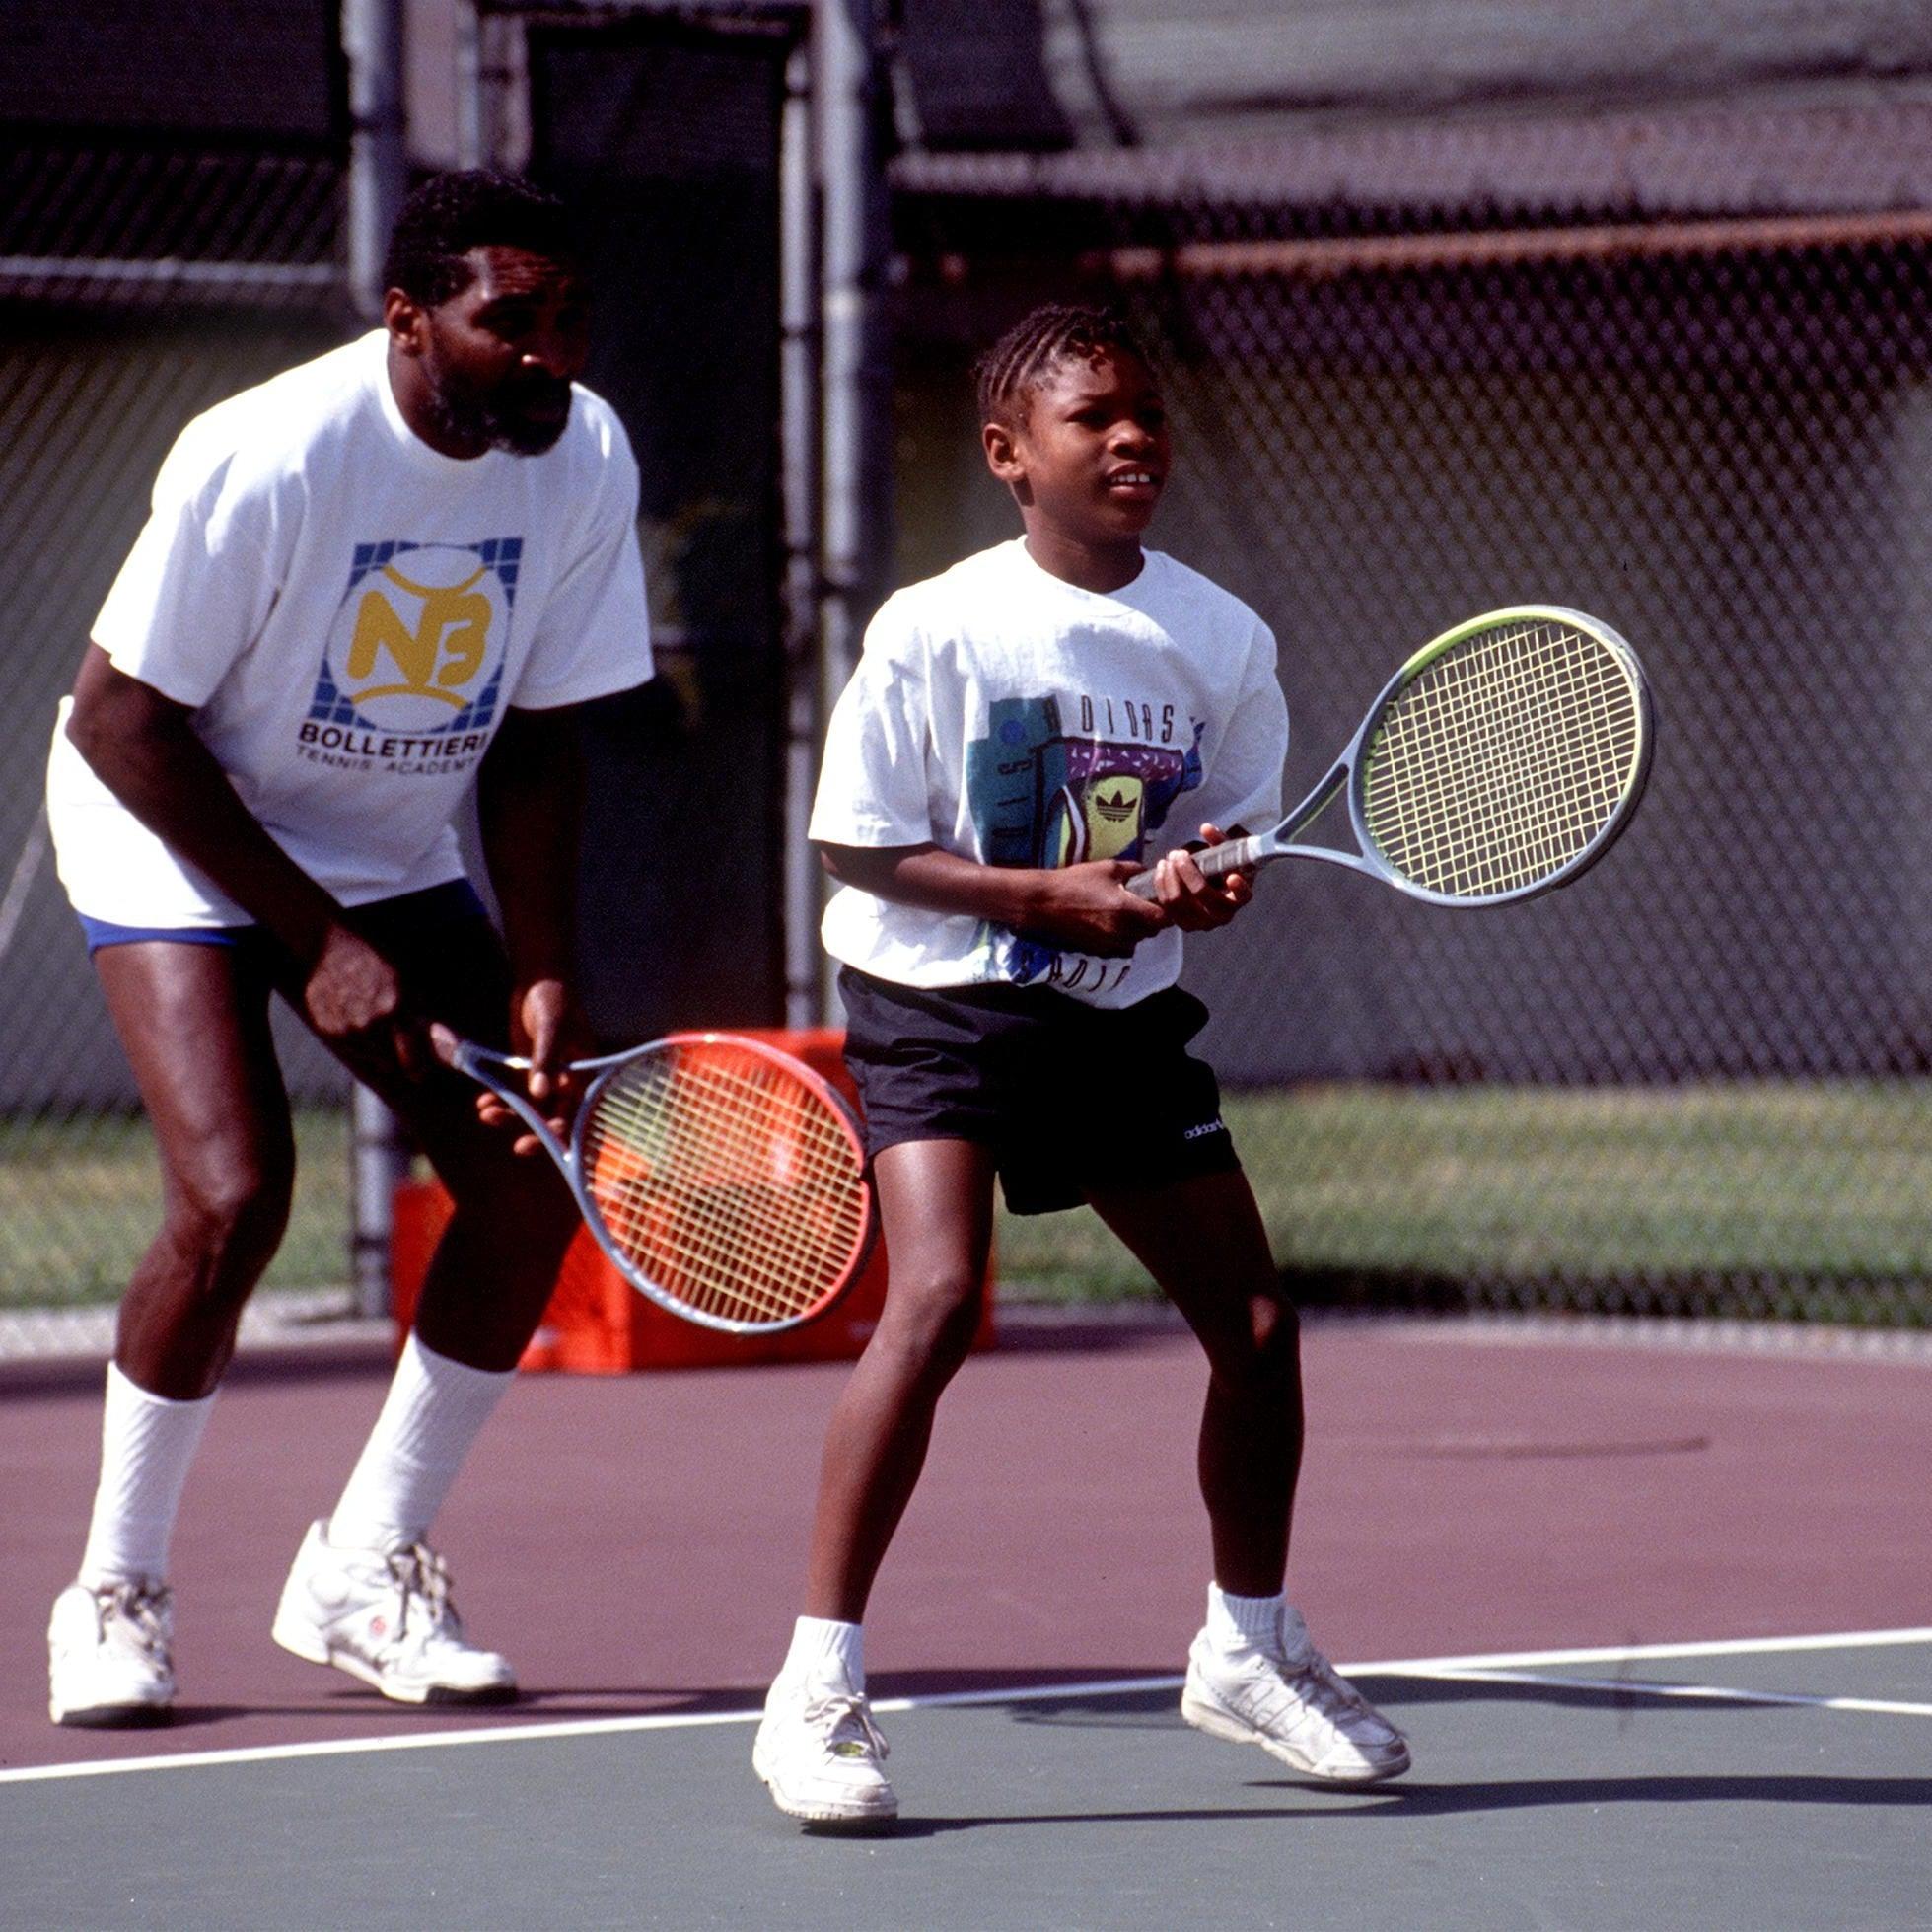 violinista animación cebra  Serena Williams Nike Ad With Home Video of Her Dad   POPSUGAR Family